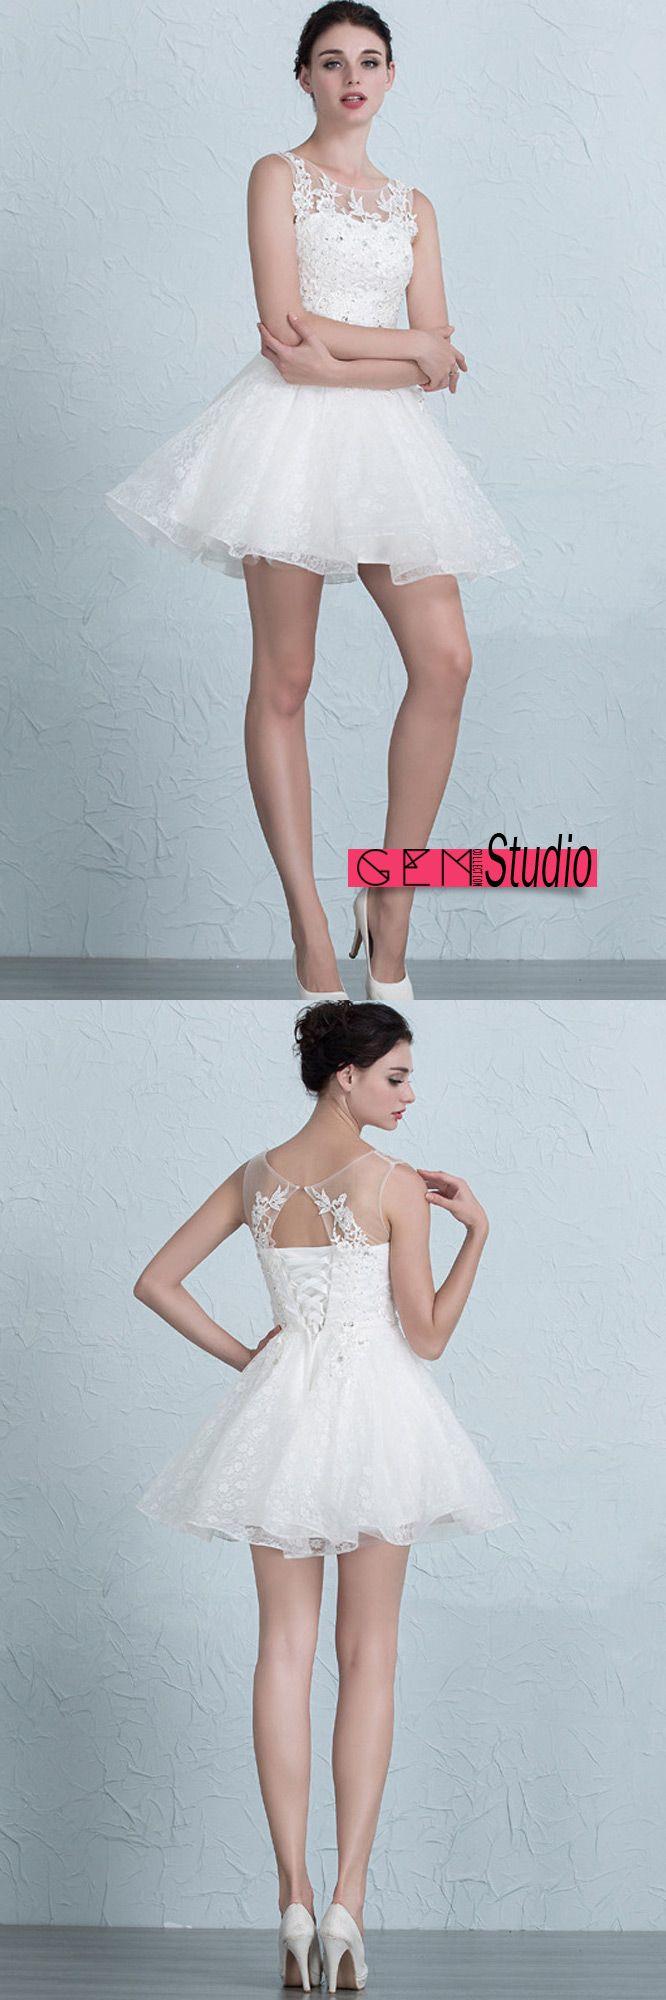 Cute Lace Reception Short Wedding Dresses Tutu A-Line Scoop Neck ...